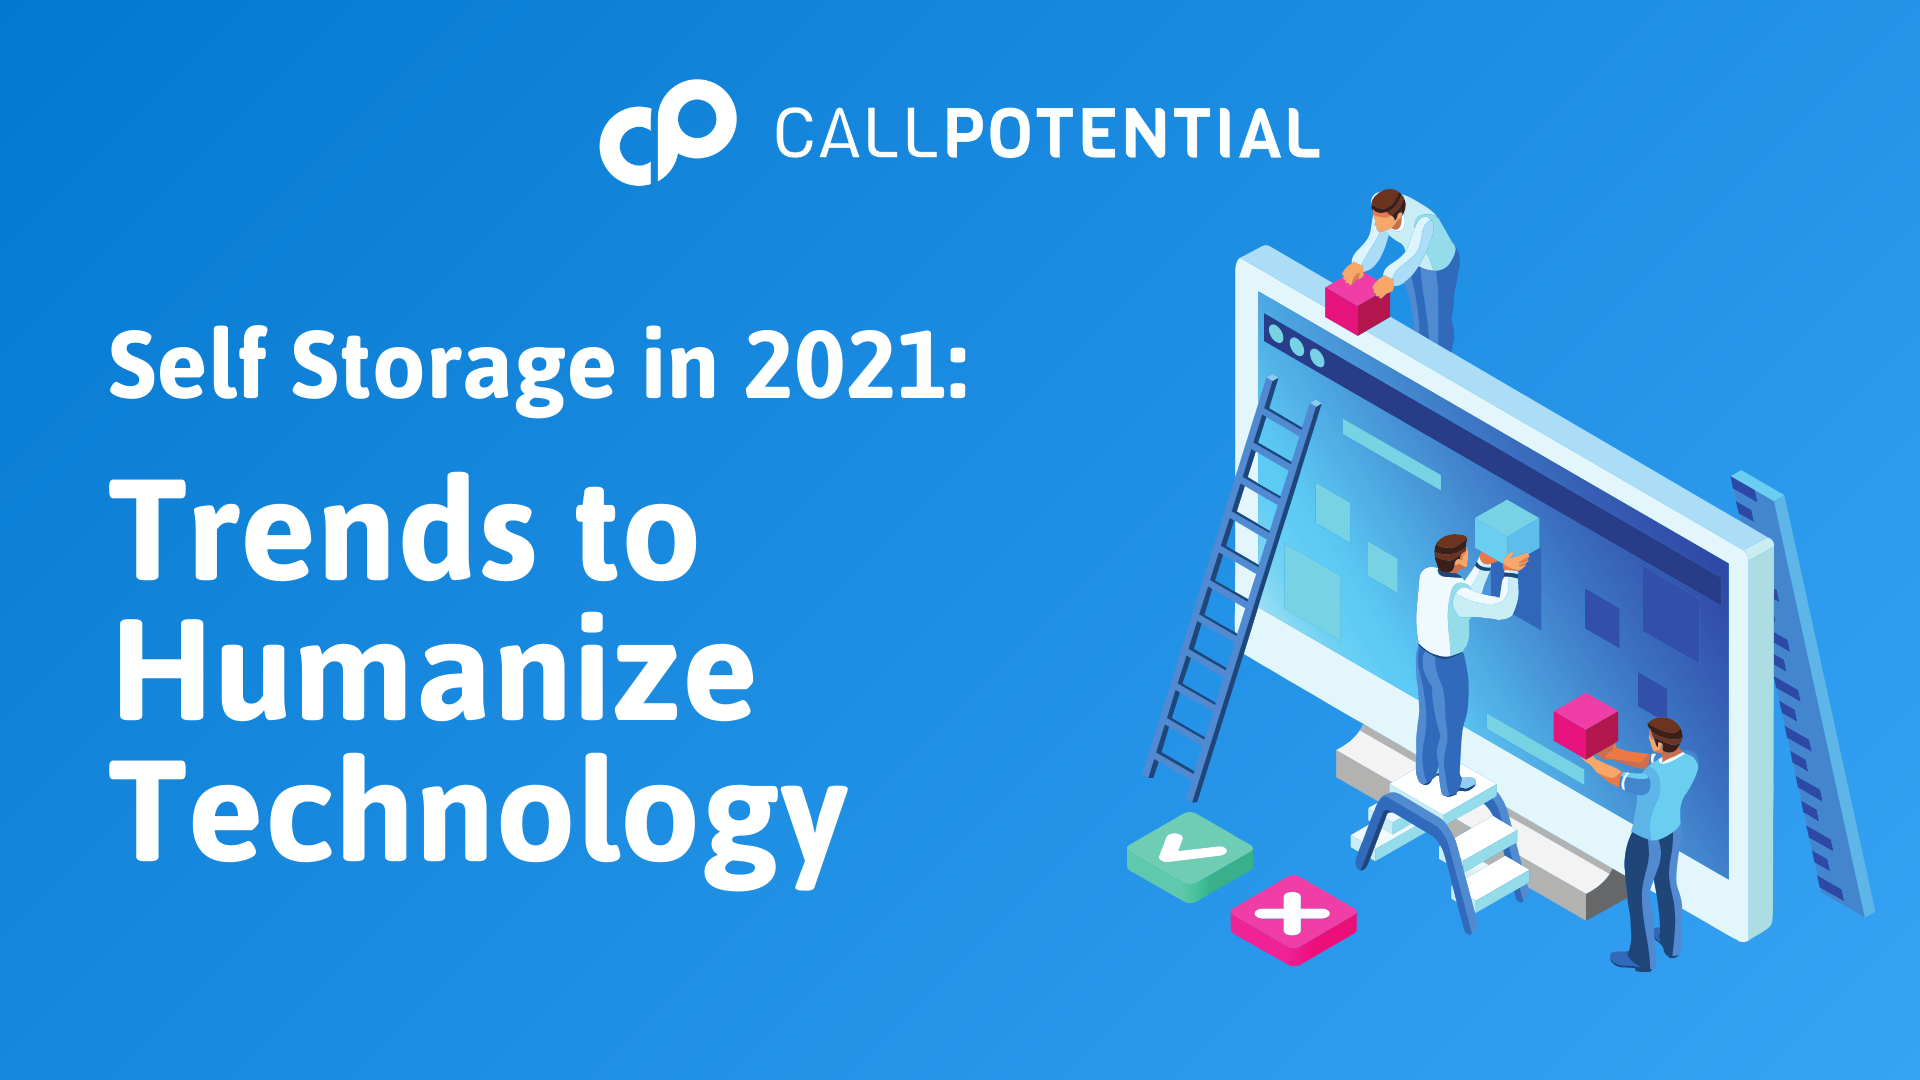 Humanizing Technology in 2021 Webinar